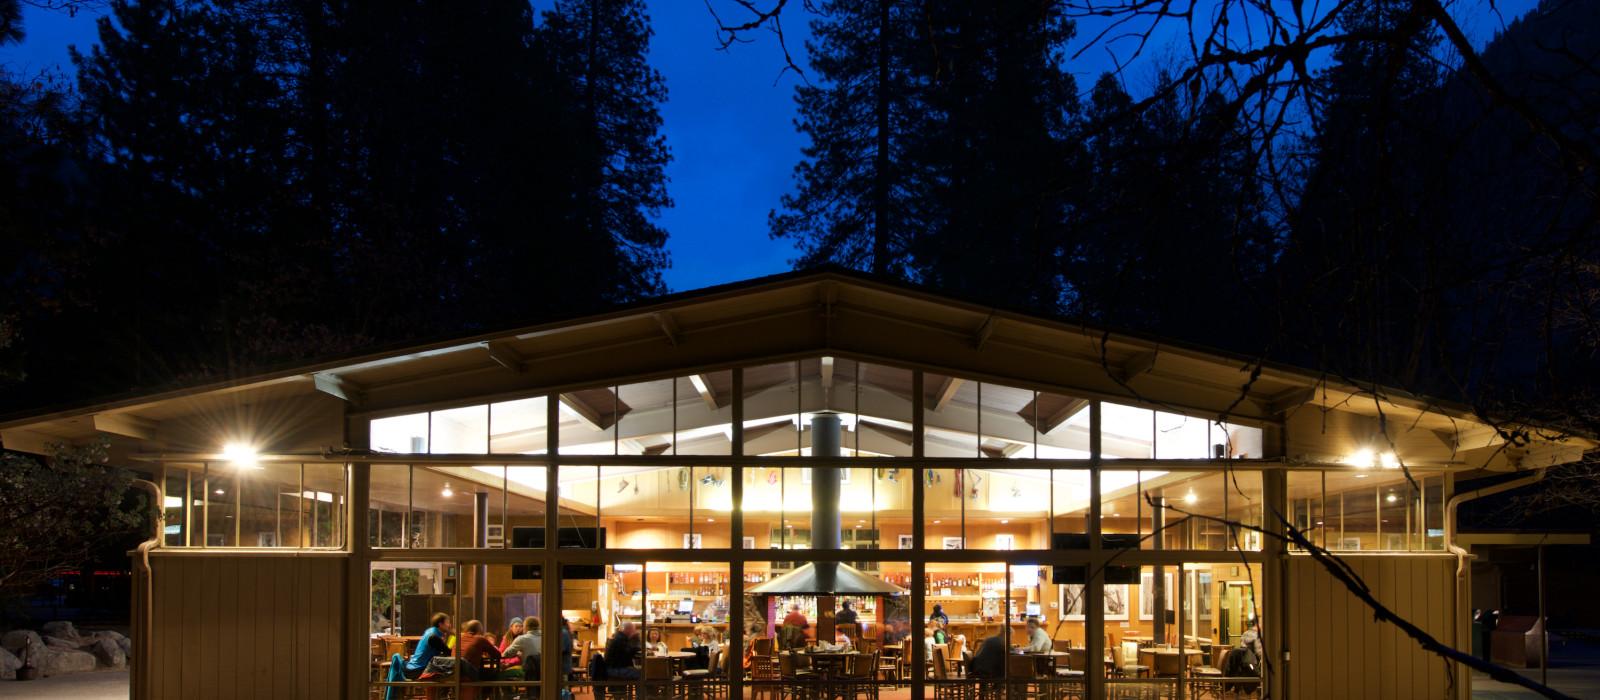 Hotel Yosemite Valley Lodge (Yosemite NP) USA